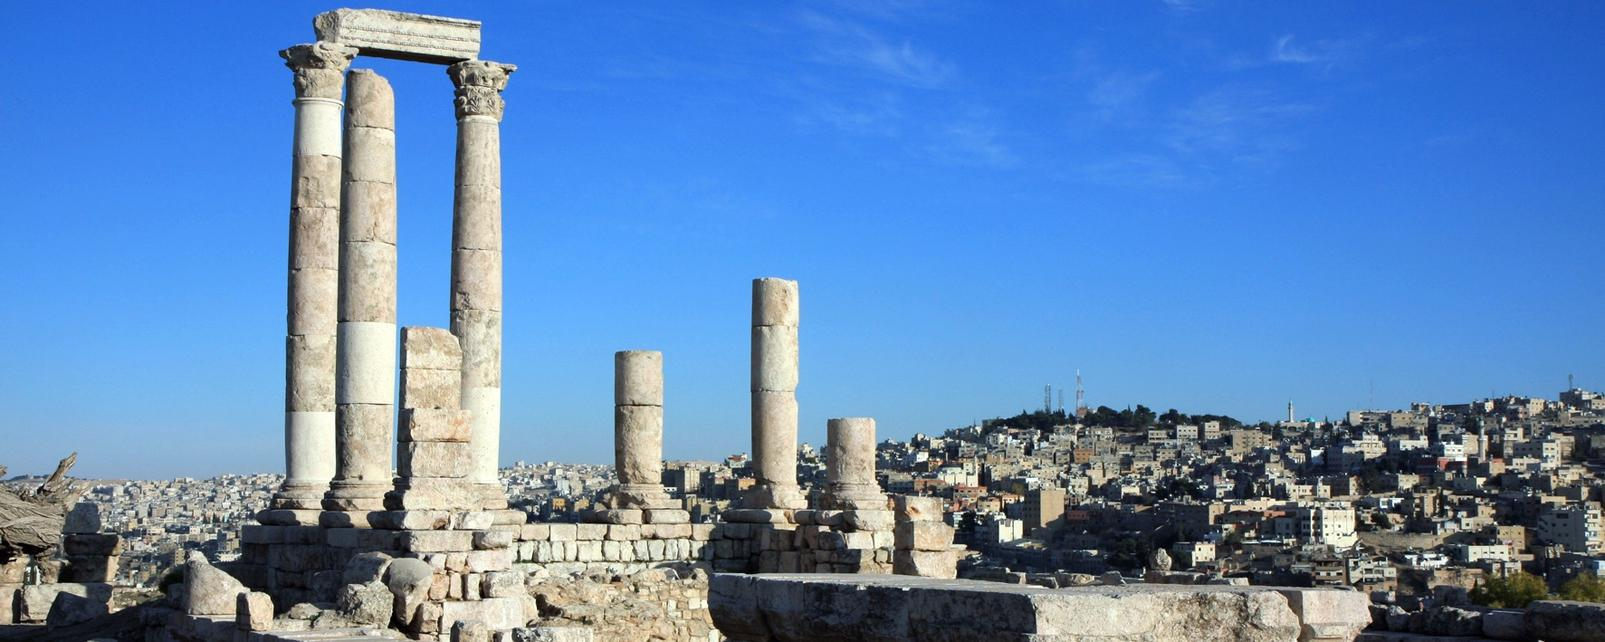 Moyen-Orient; Jordanie; Amman;